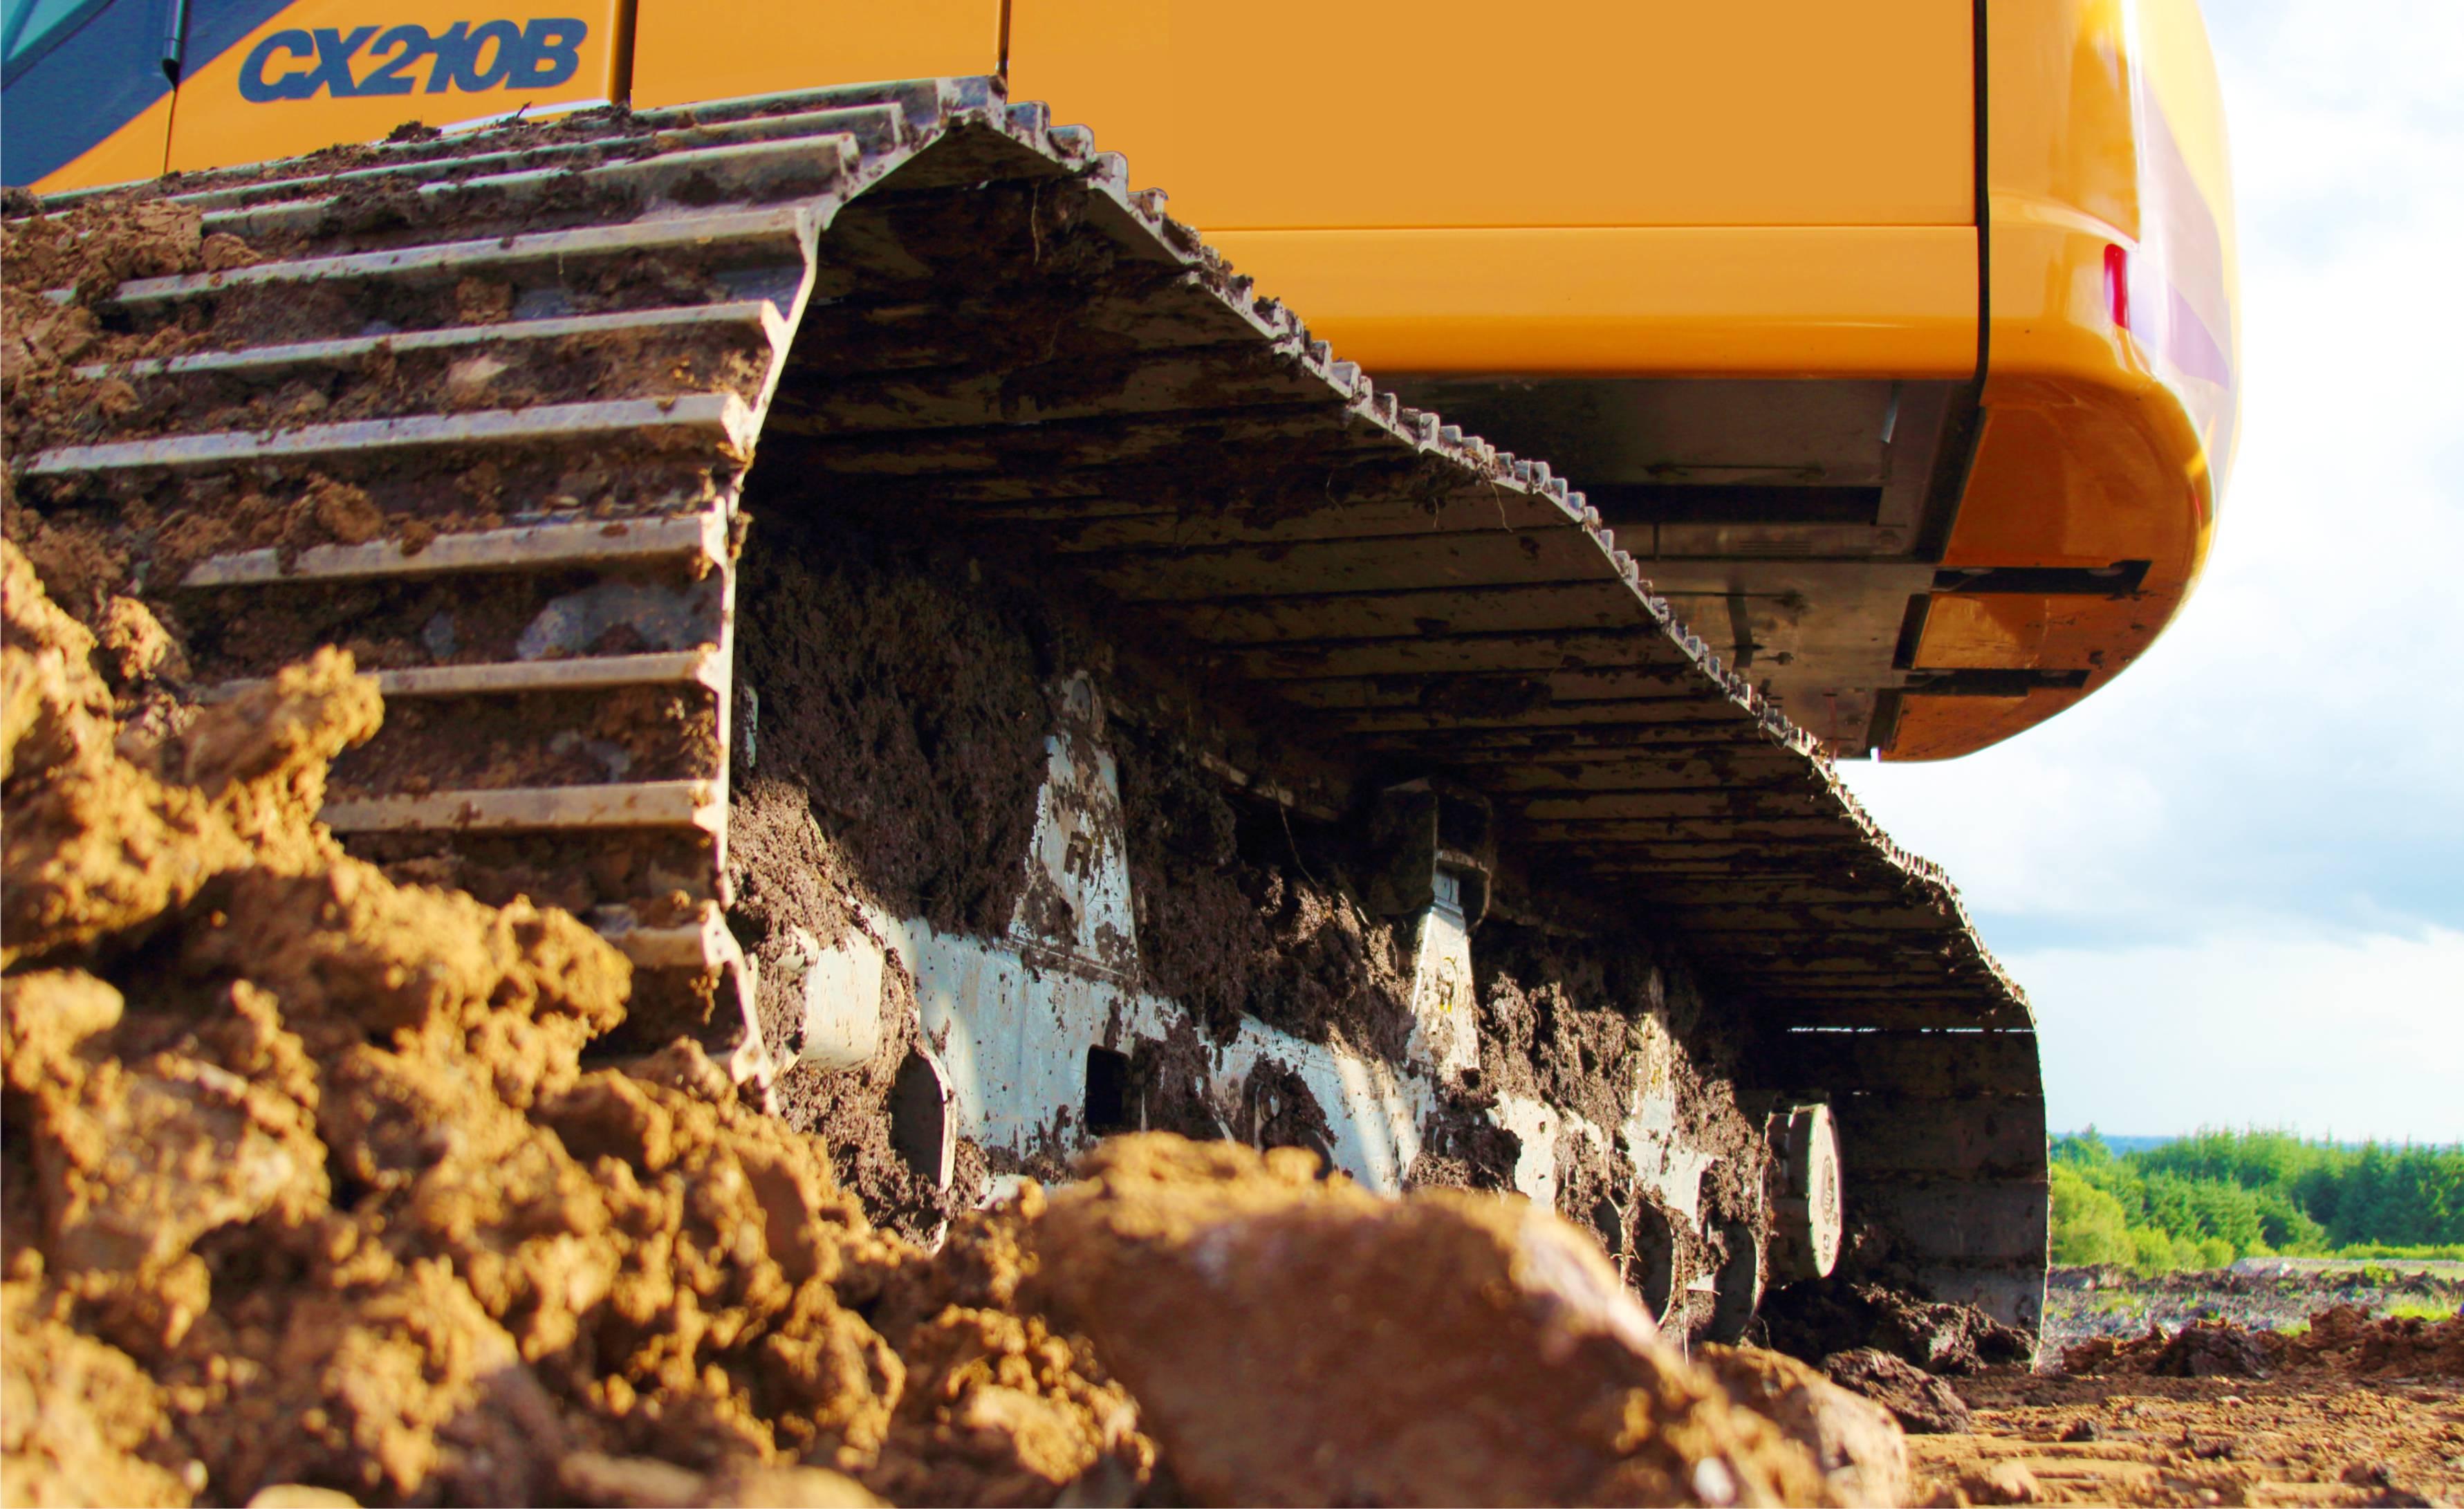 210 Excavator Undercarriage